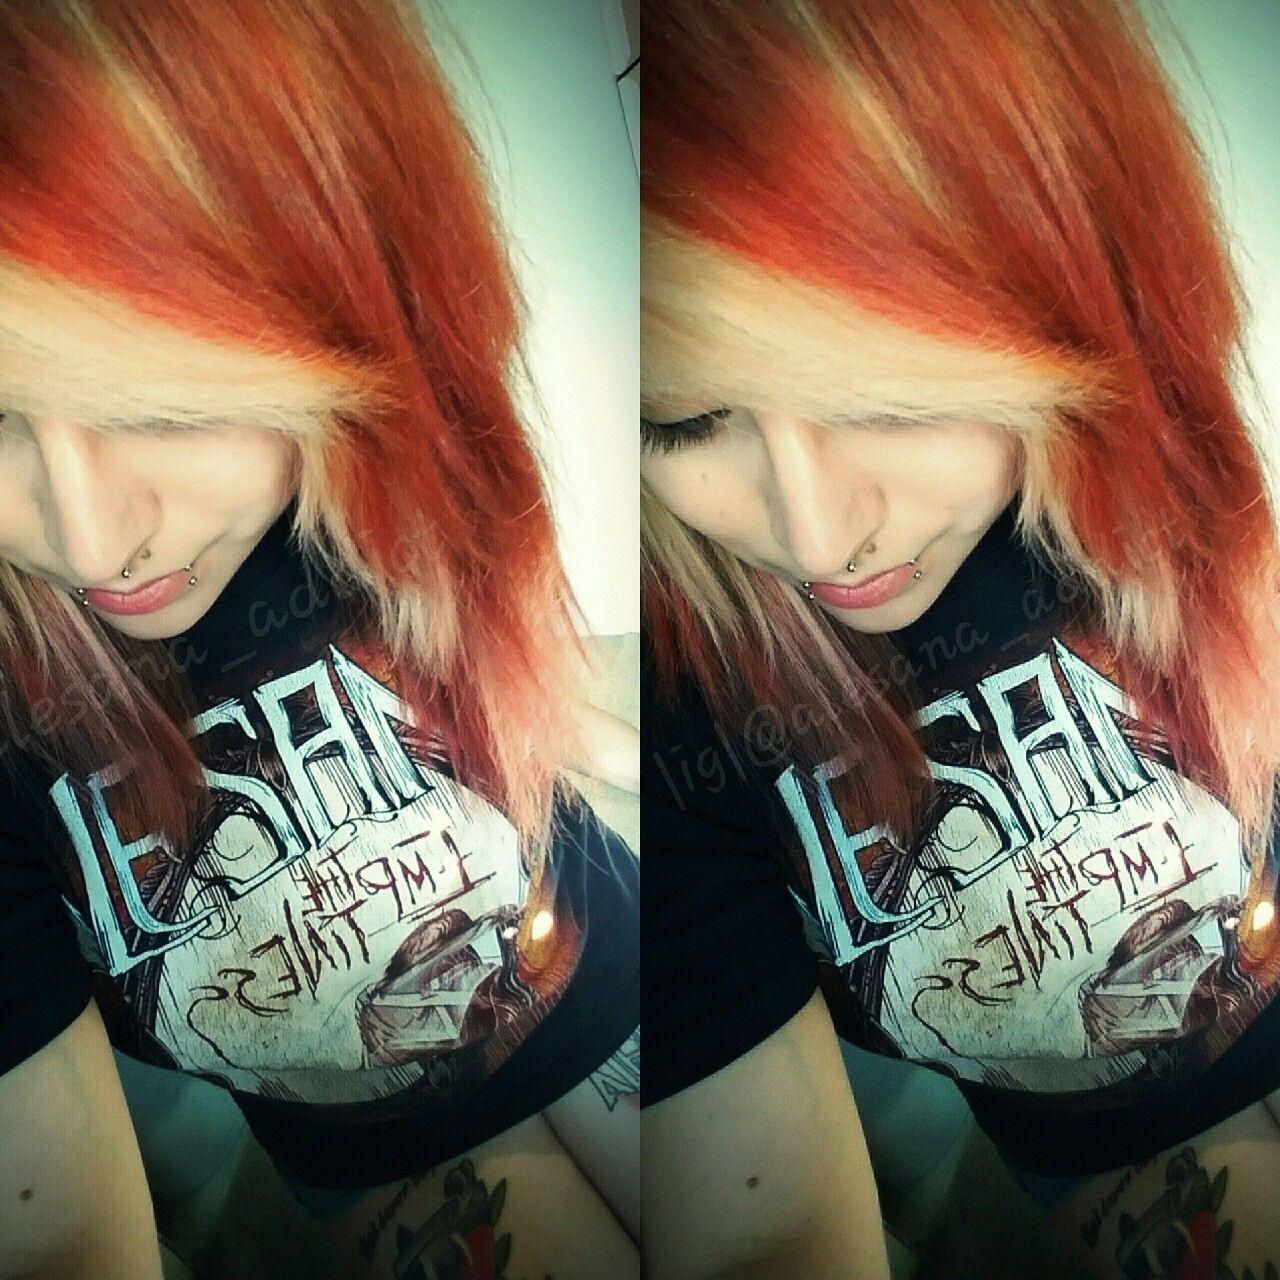 @alesana_addict #redhair #blondehair #fox #foxhair #alesana #theemptiness #piercings #septum #snakebites